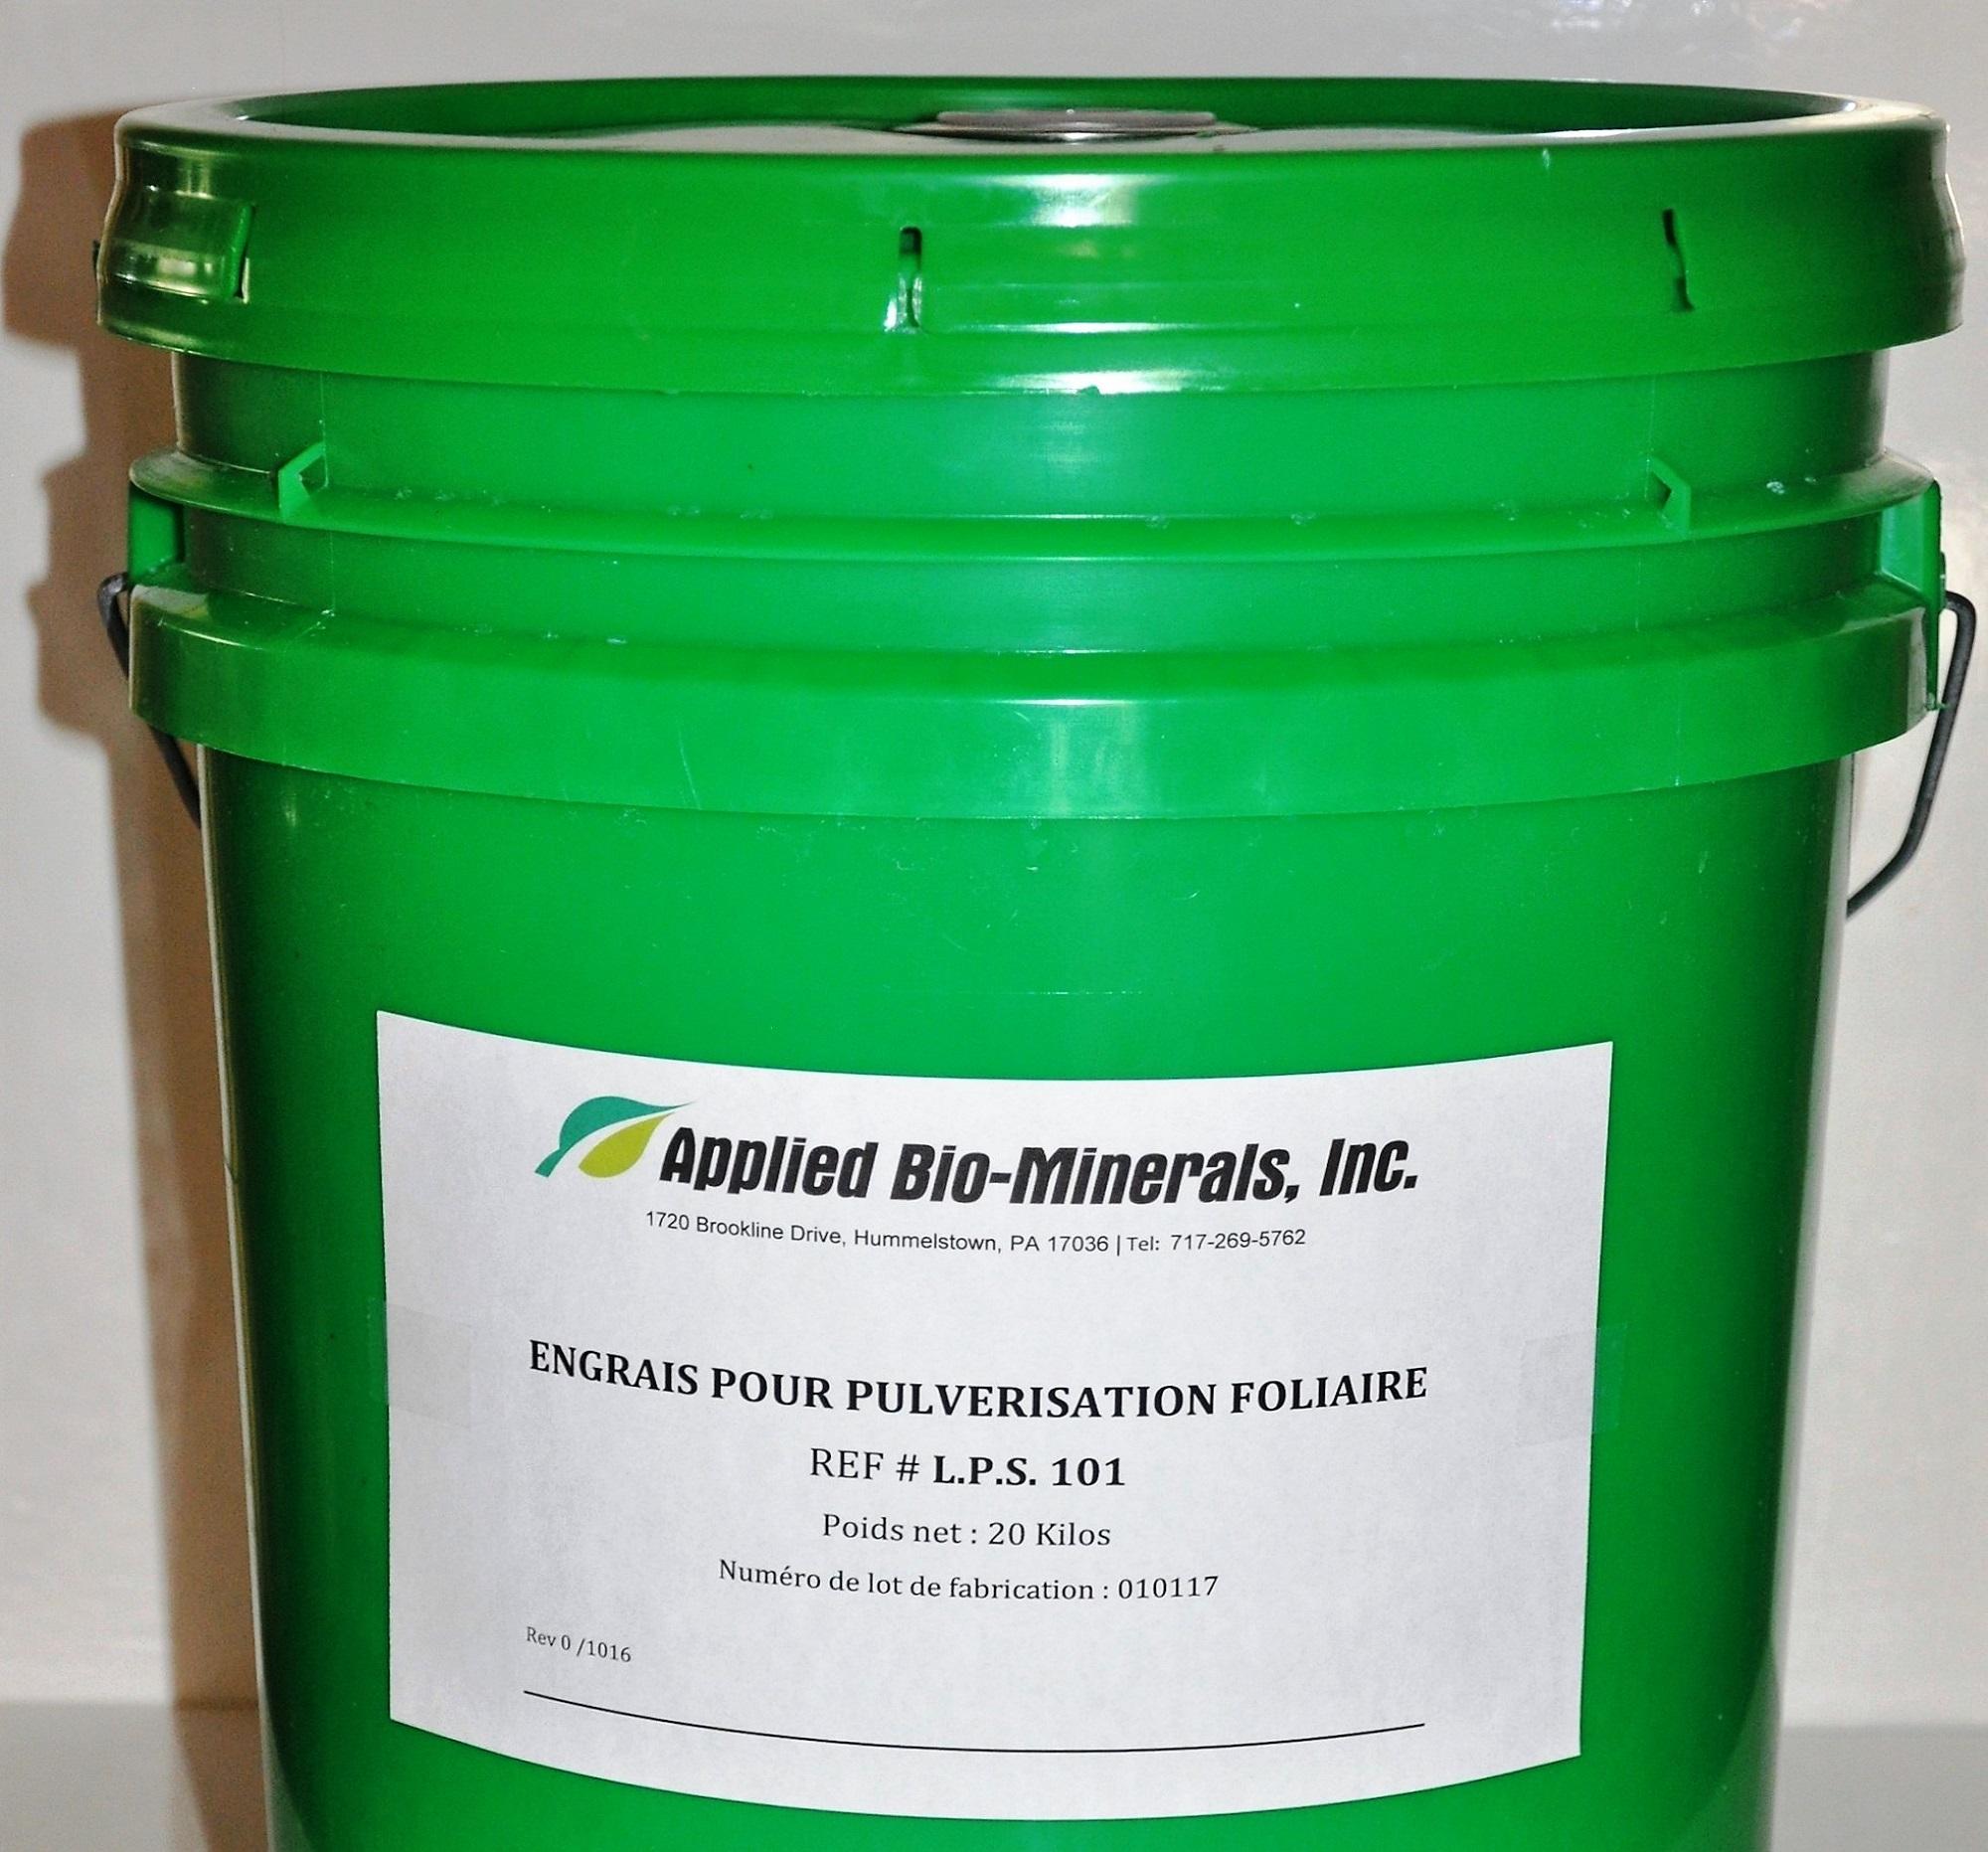 Applied Bio-Minerals - ABM - Agriculture Durable-biologique - LPS 101.JPG